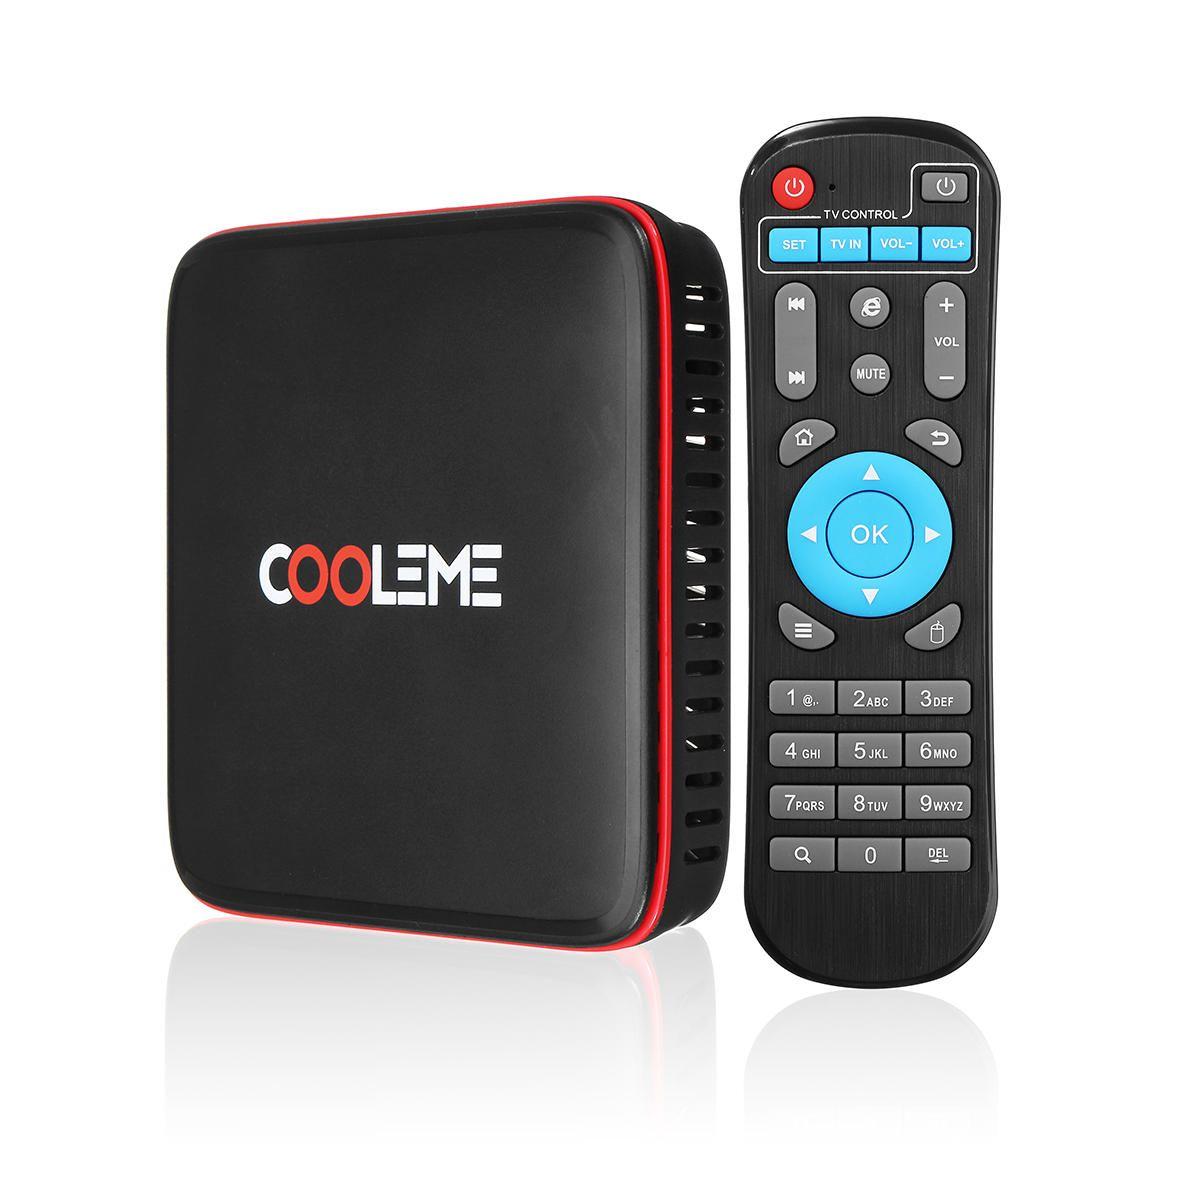 Us 45 99 25 Cooleme Cm Mm1 Amlogic S905w 2gb Ram 16gb Rom Tv Box